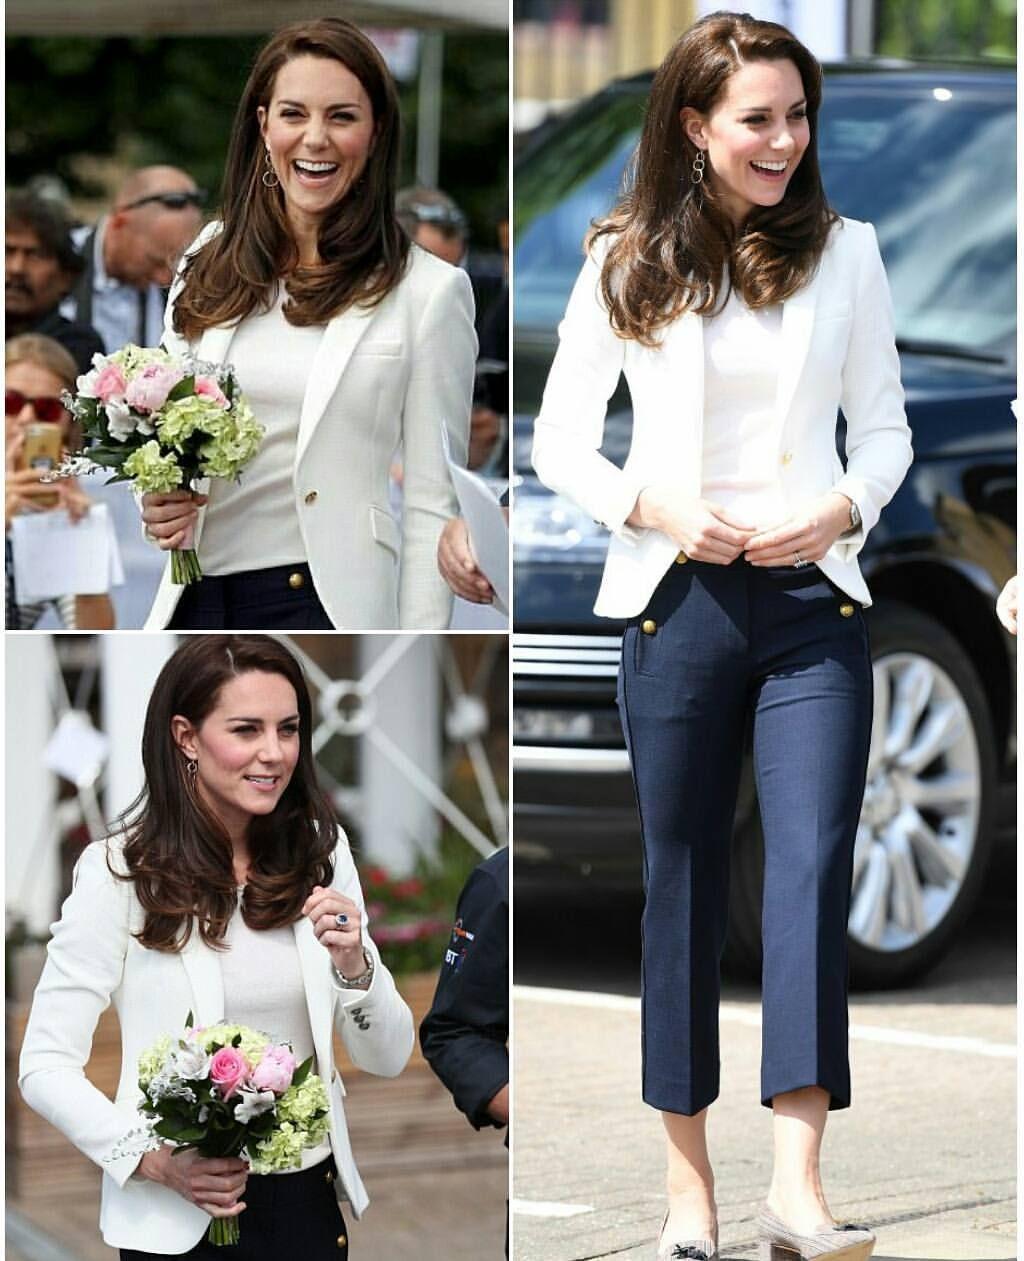 Pin By Tanja Doss On Duke And Duchess Of Cambridge In 2018 Hugo Boss Endrio Hitam 1497 Likes 15 Comments Catherine Elizabeth Middleton Katemiddletonphoto Instagram